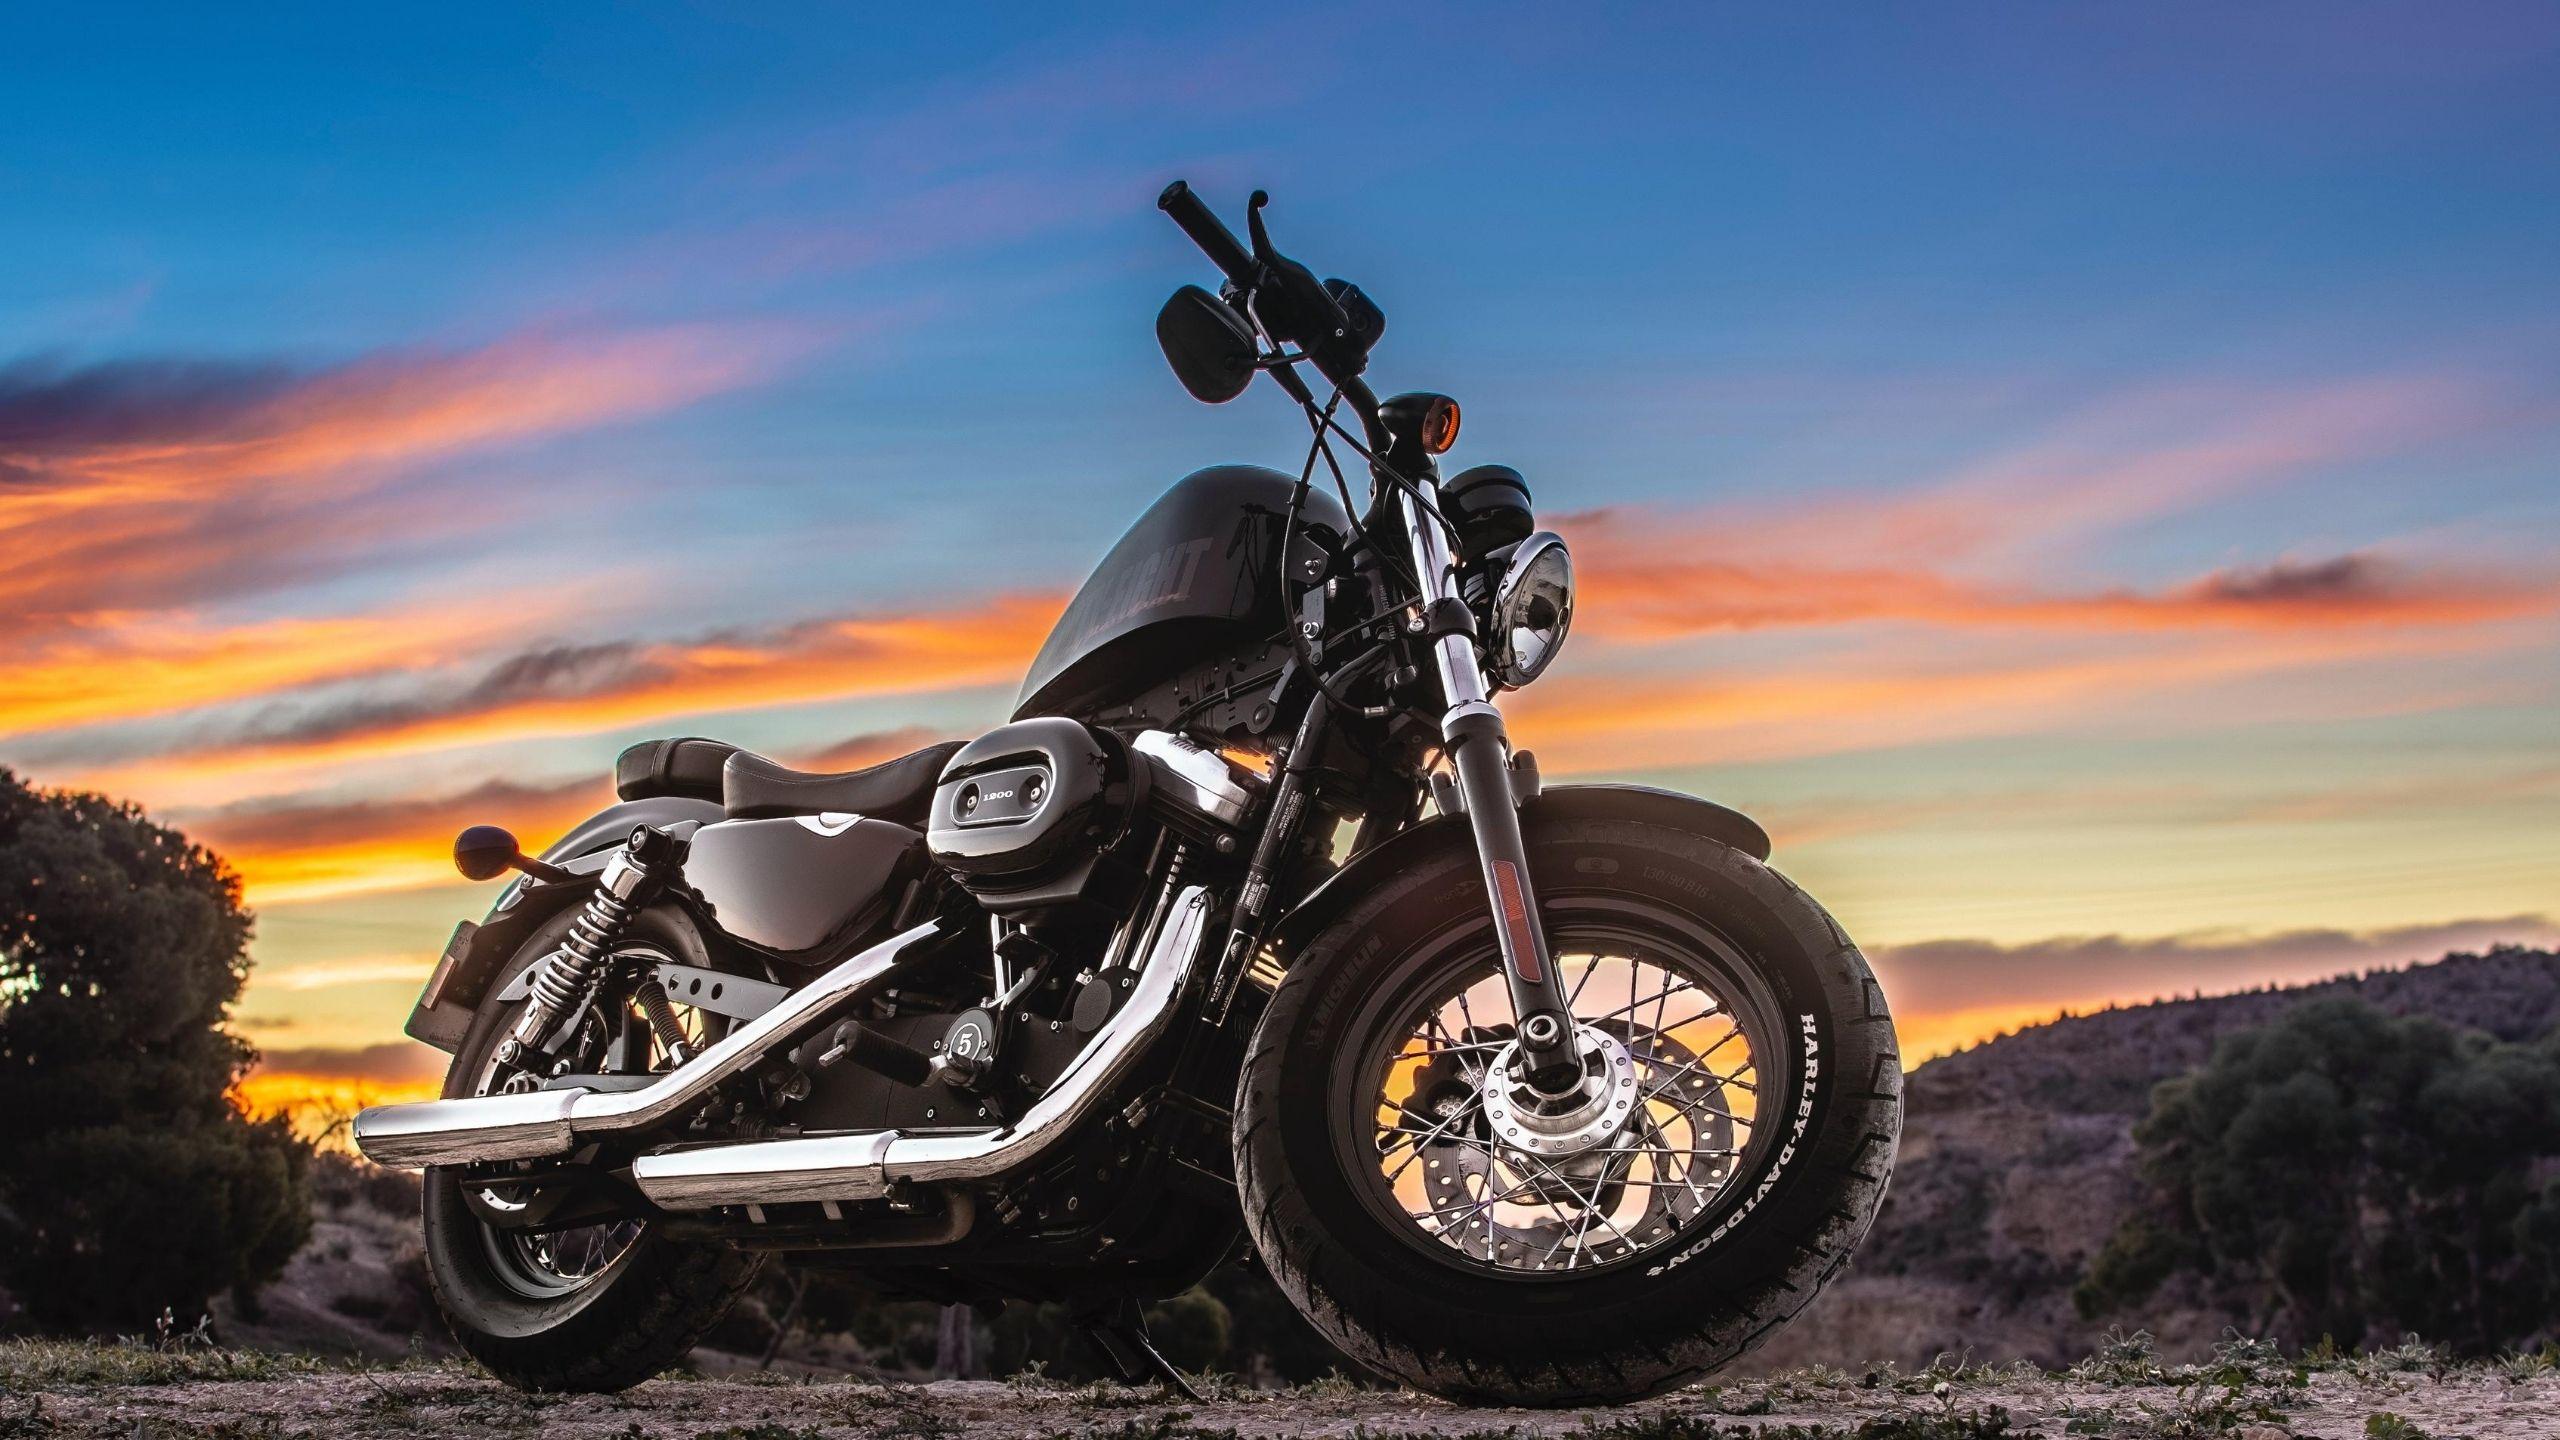 Newsweek AMPLIFY 7 Tips on Motorcycle Insurance